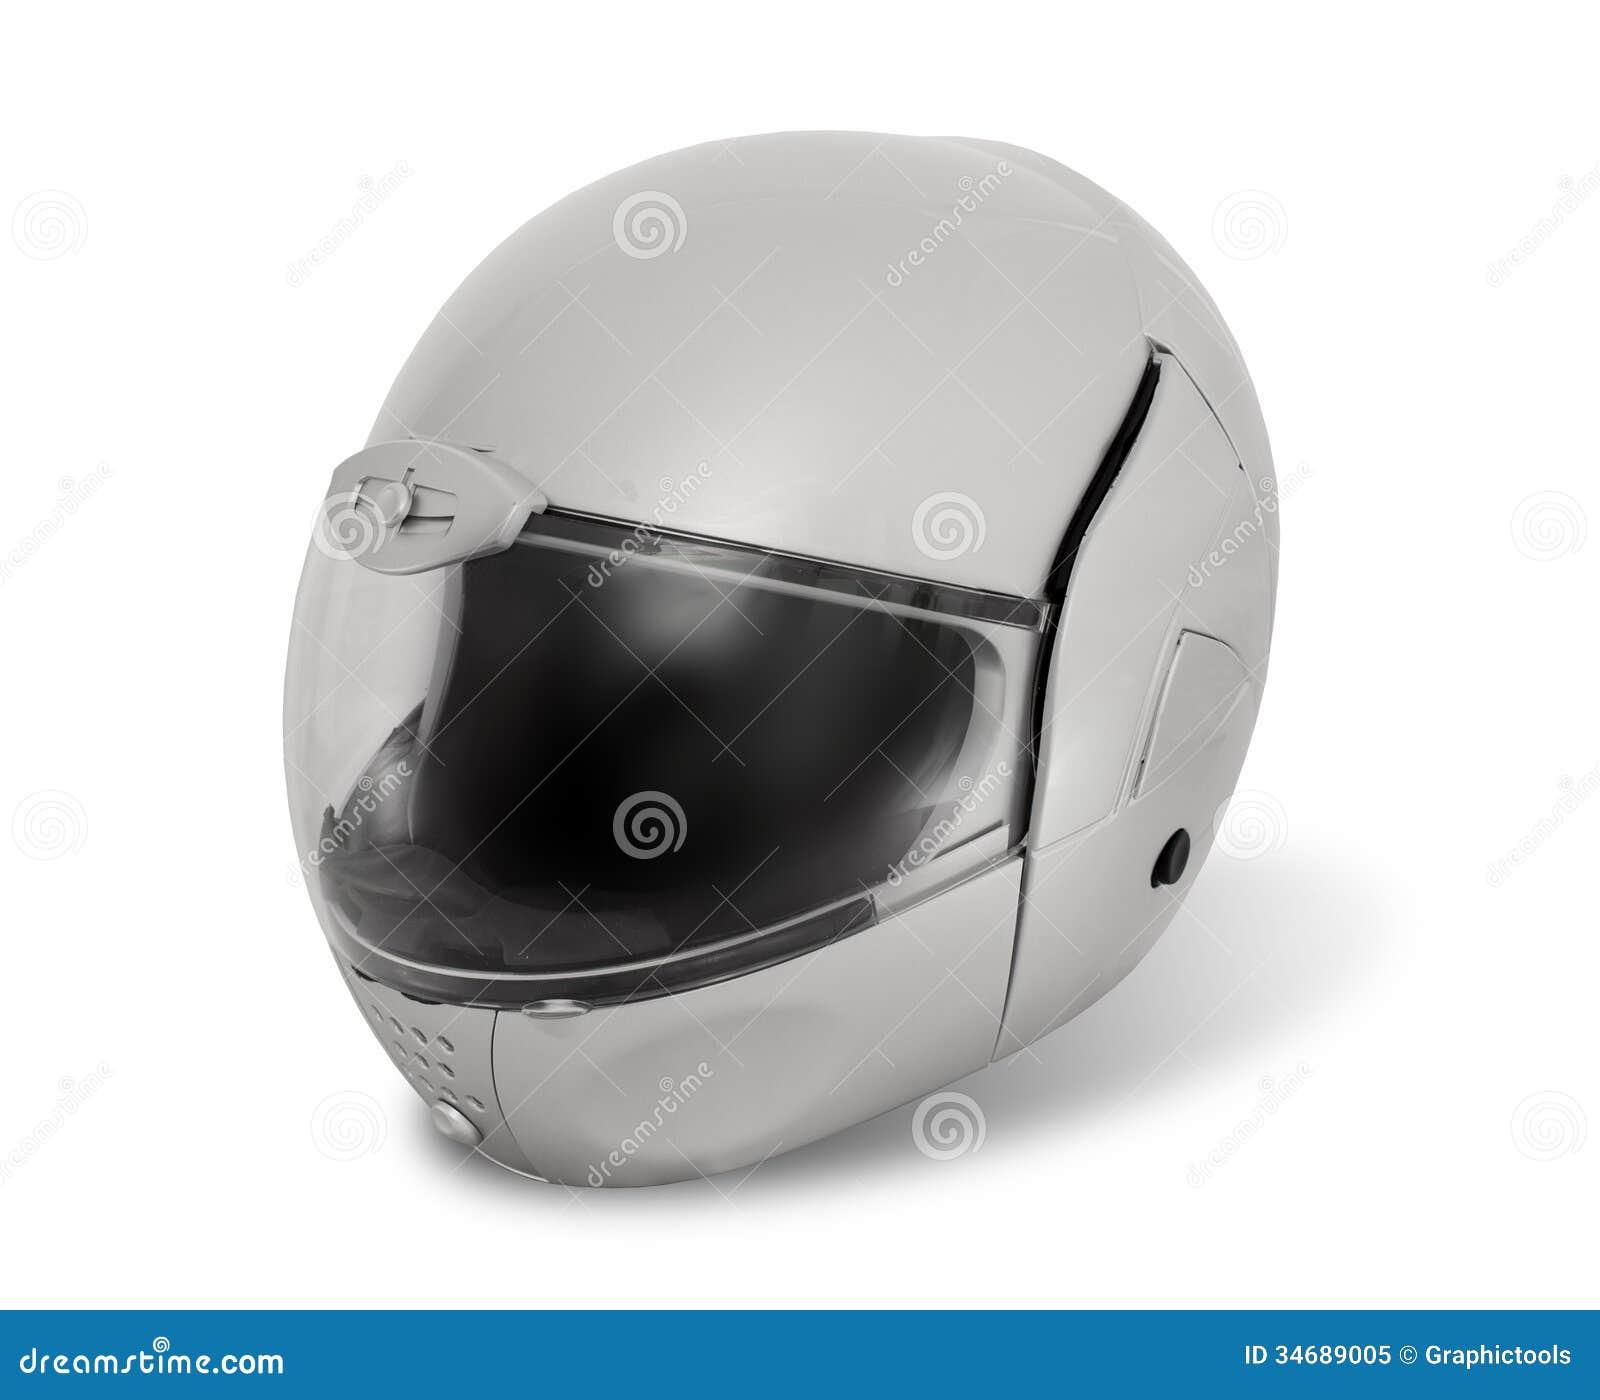 White Motorcycle Helmets - Viewing Gallery Motorcycle